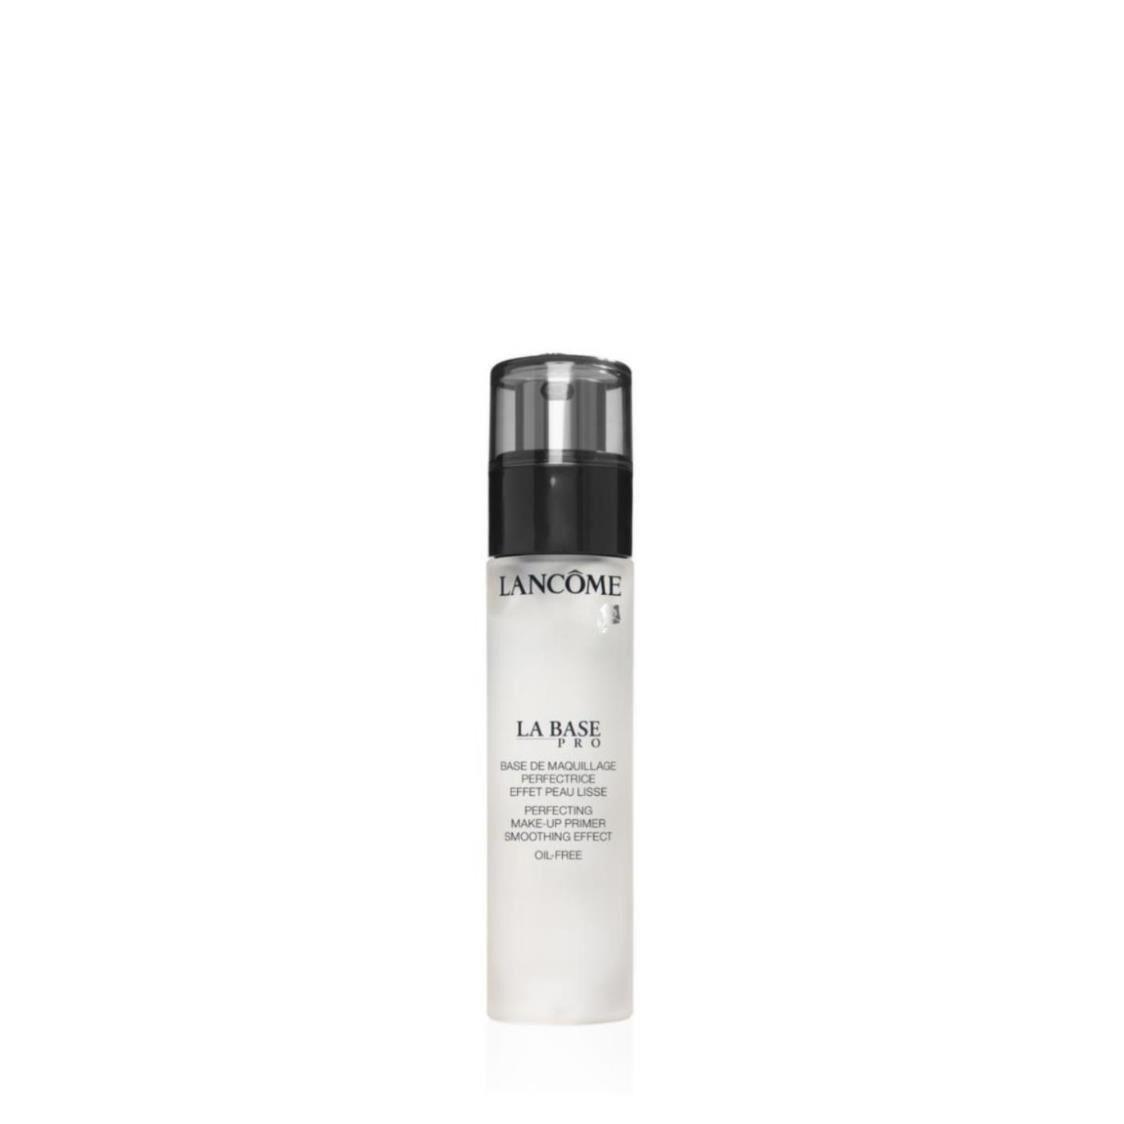 Lancome La Base Pro Perfecting Makeup Primer Smoothing Effect 25ml